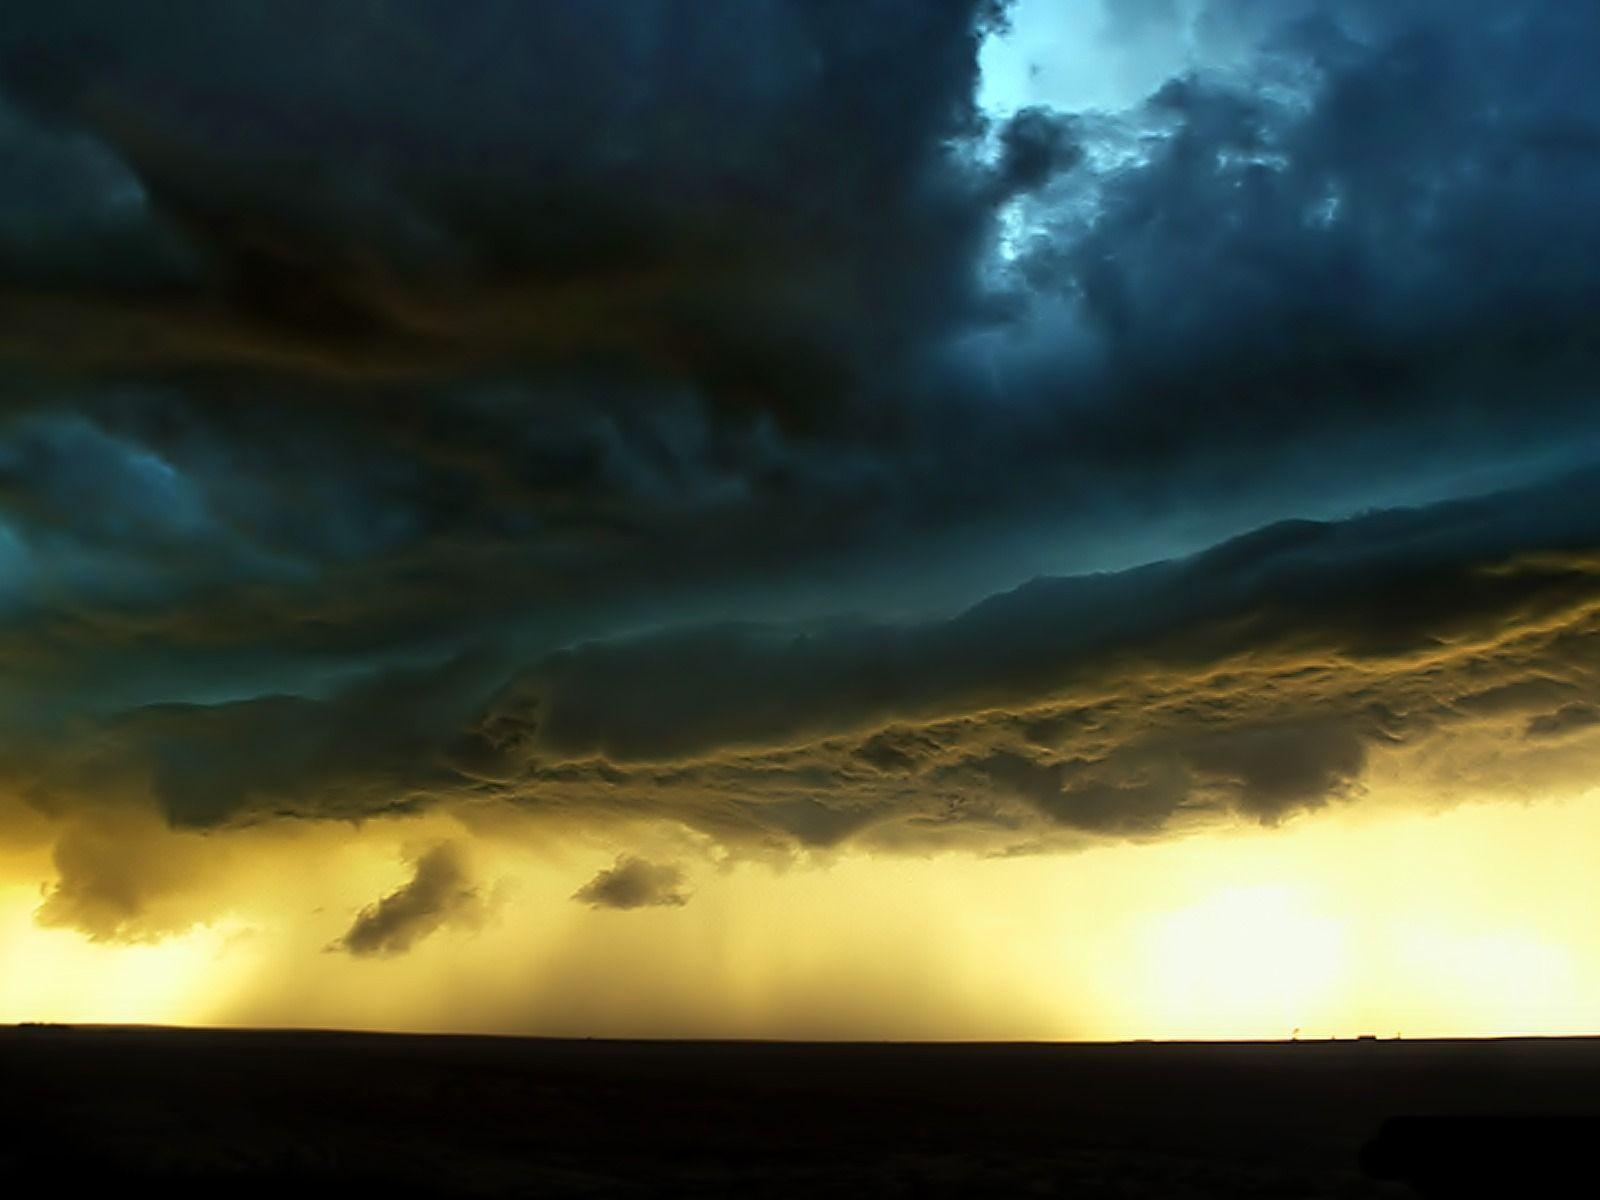 Storm Clouds Wallpapers: Storm Clouds Wallpapers